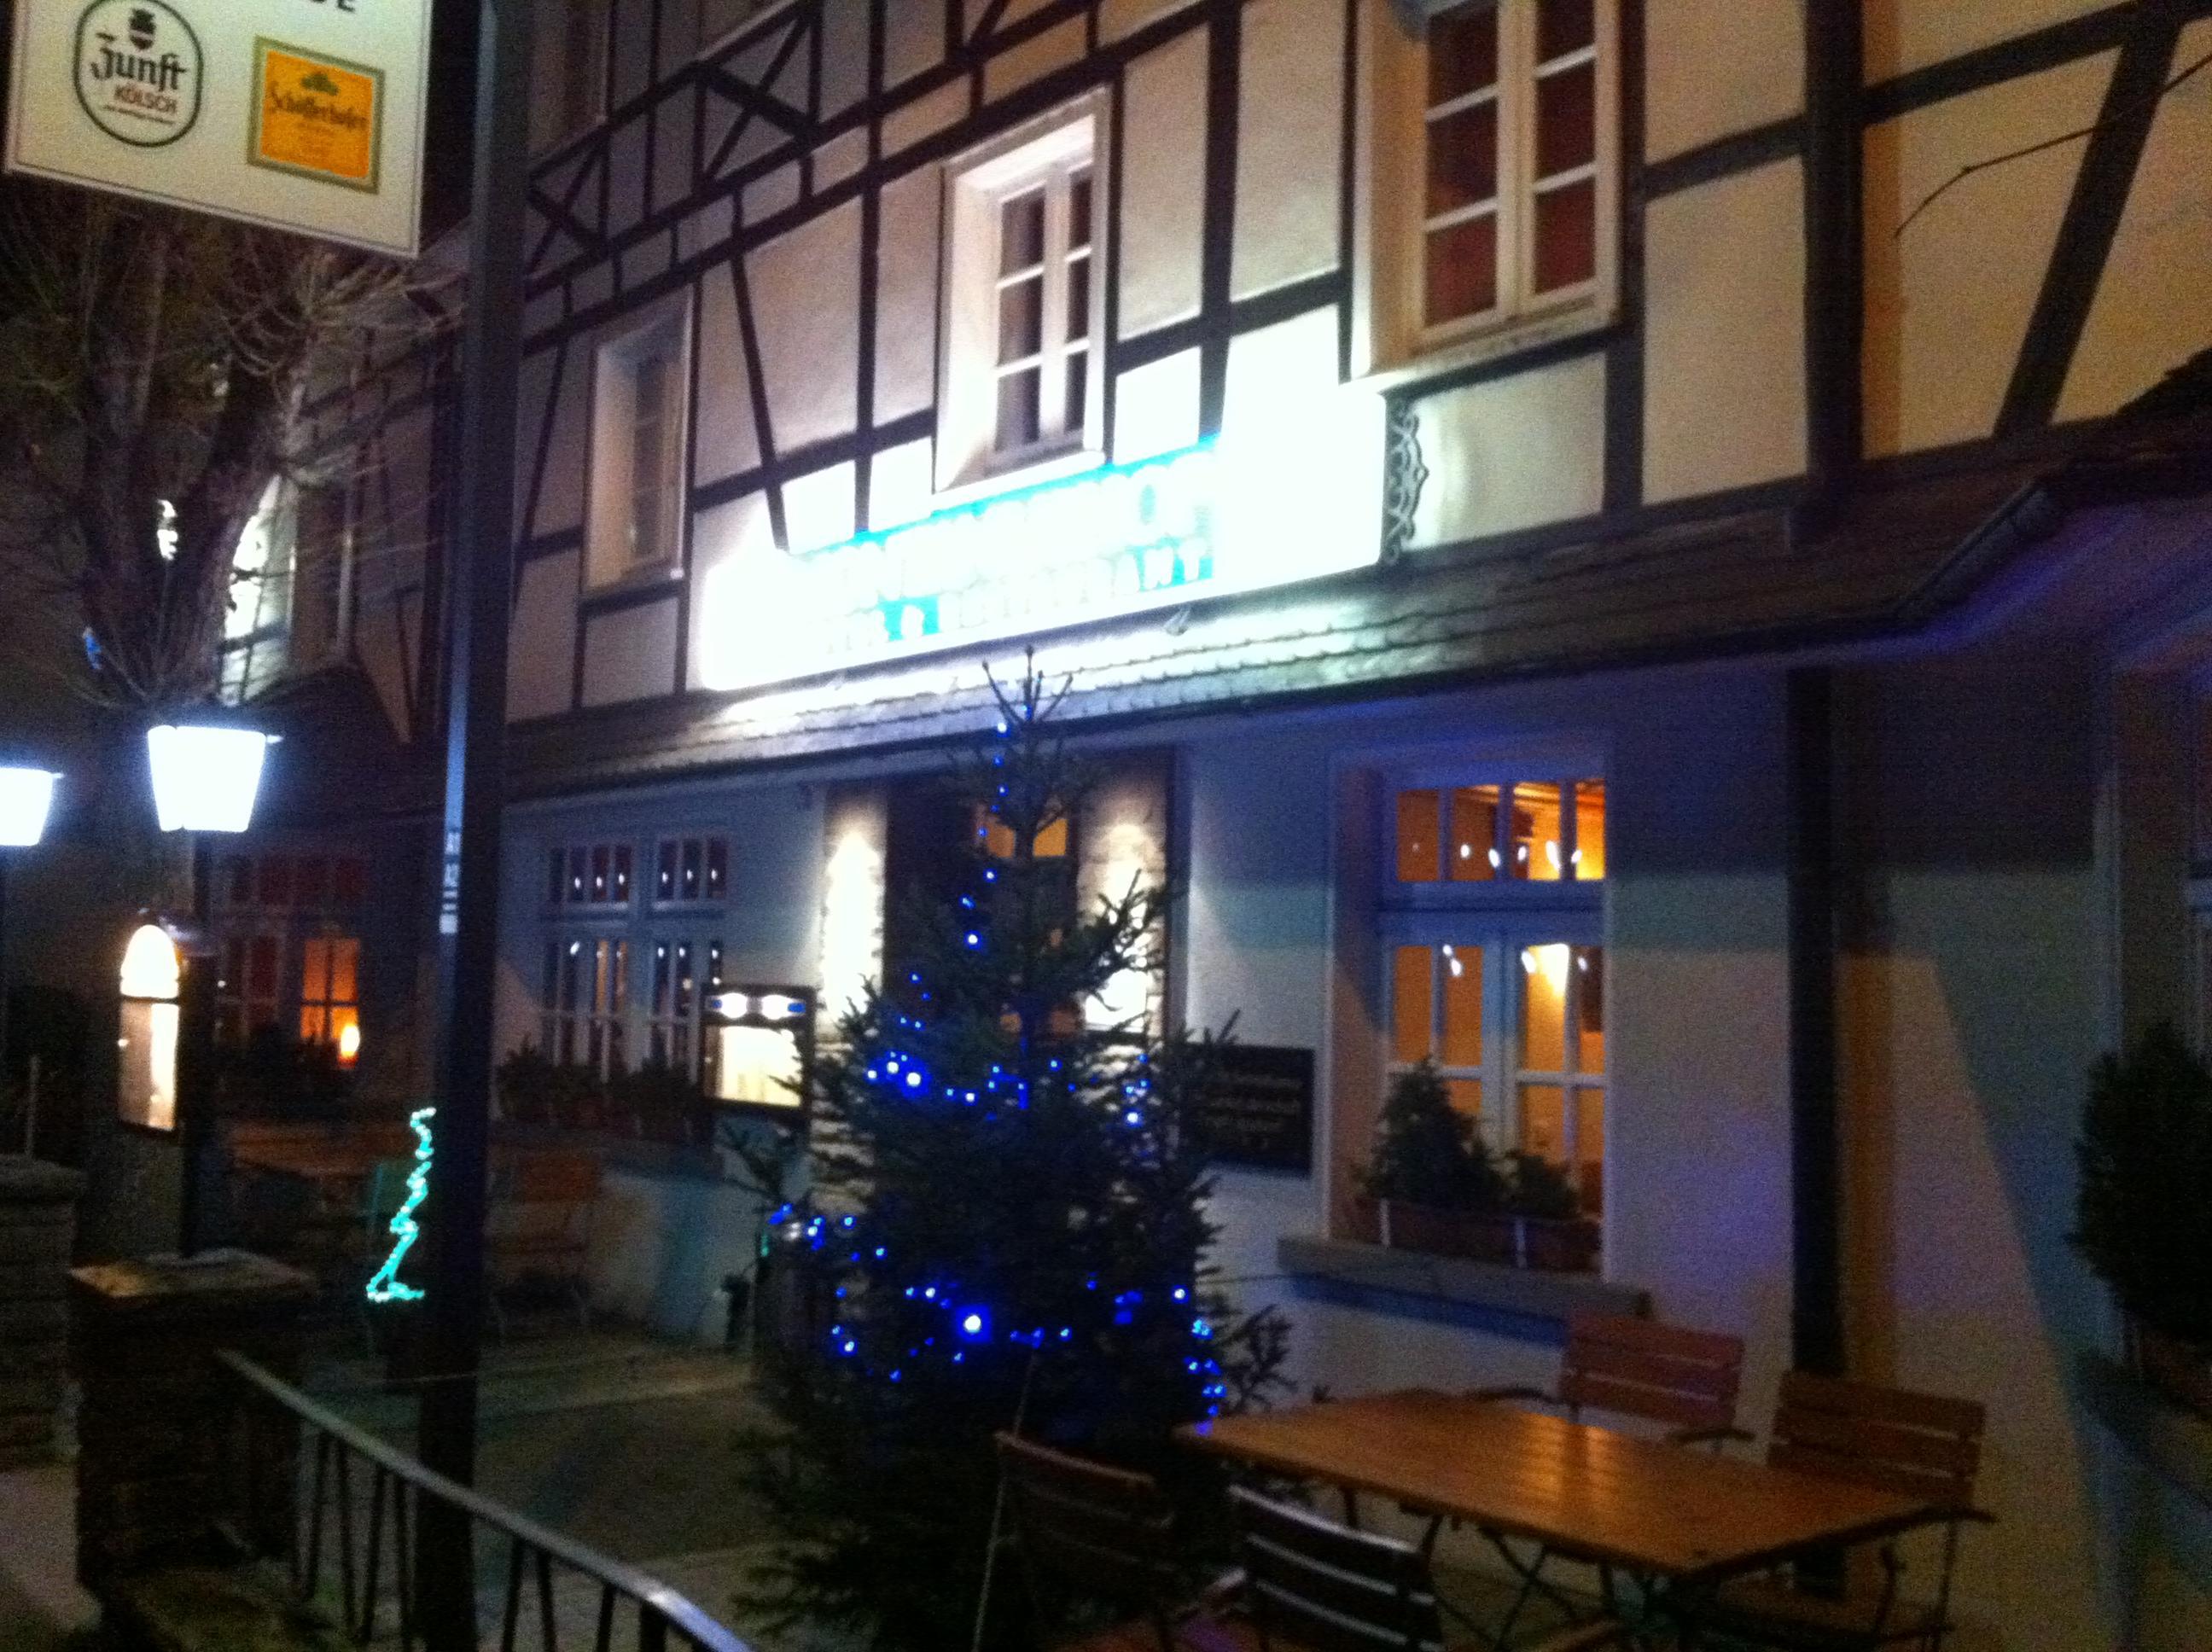 Best Diner food near Wipperfurth, North Rhine-Westphalia, Germany